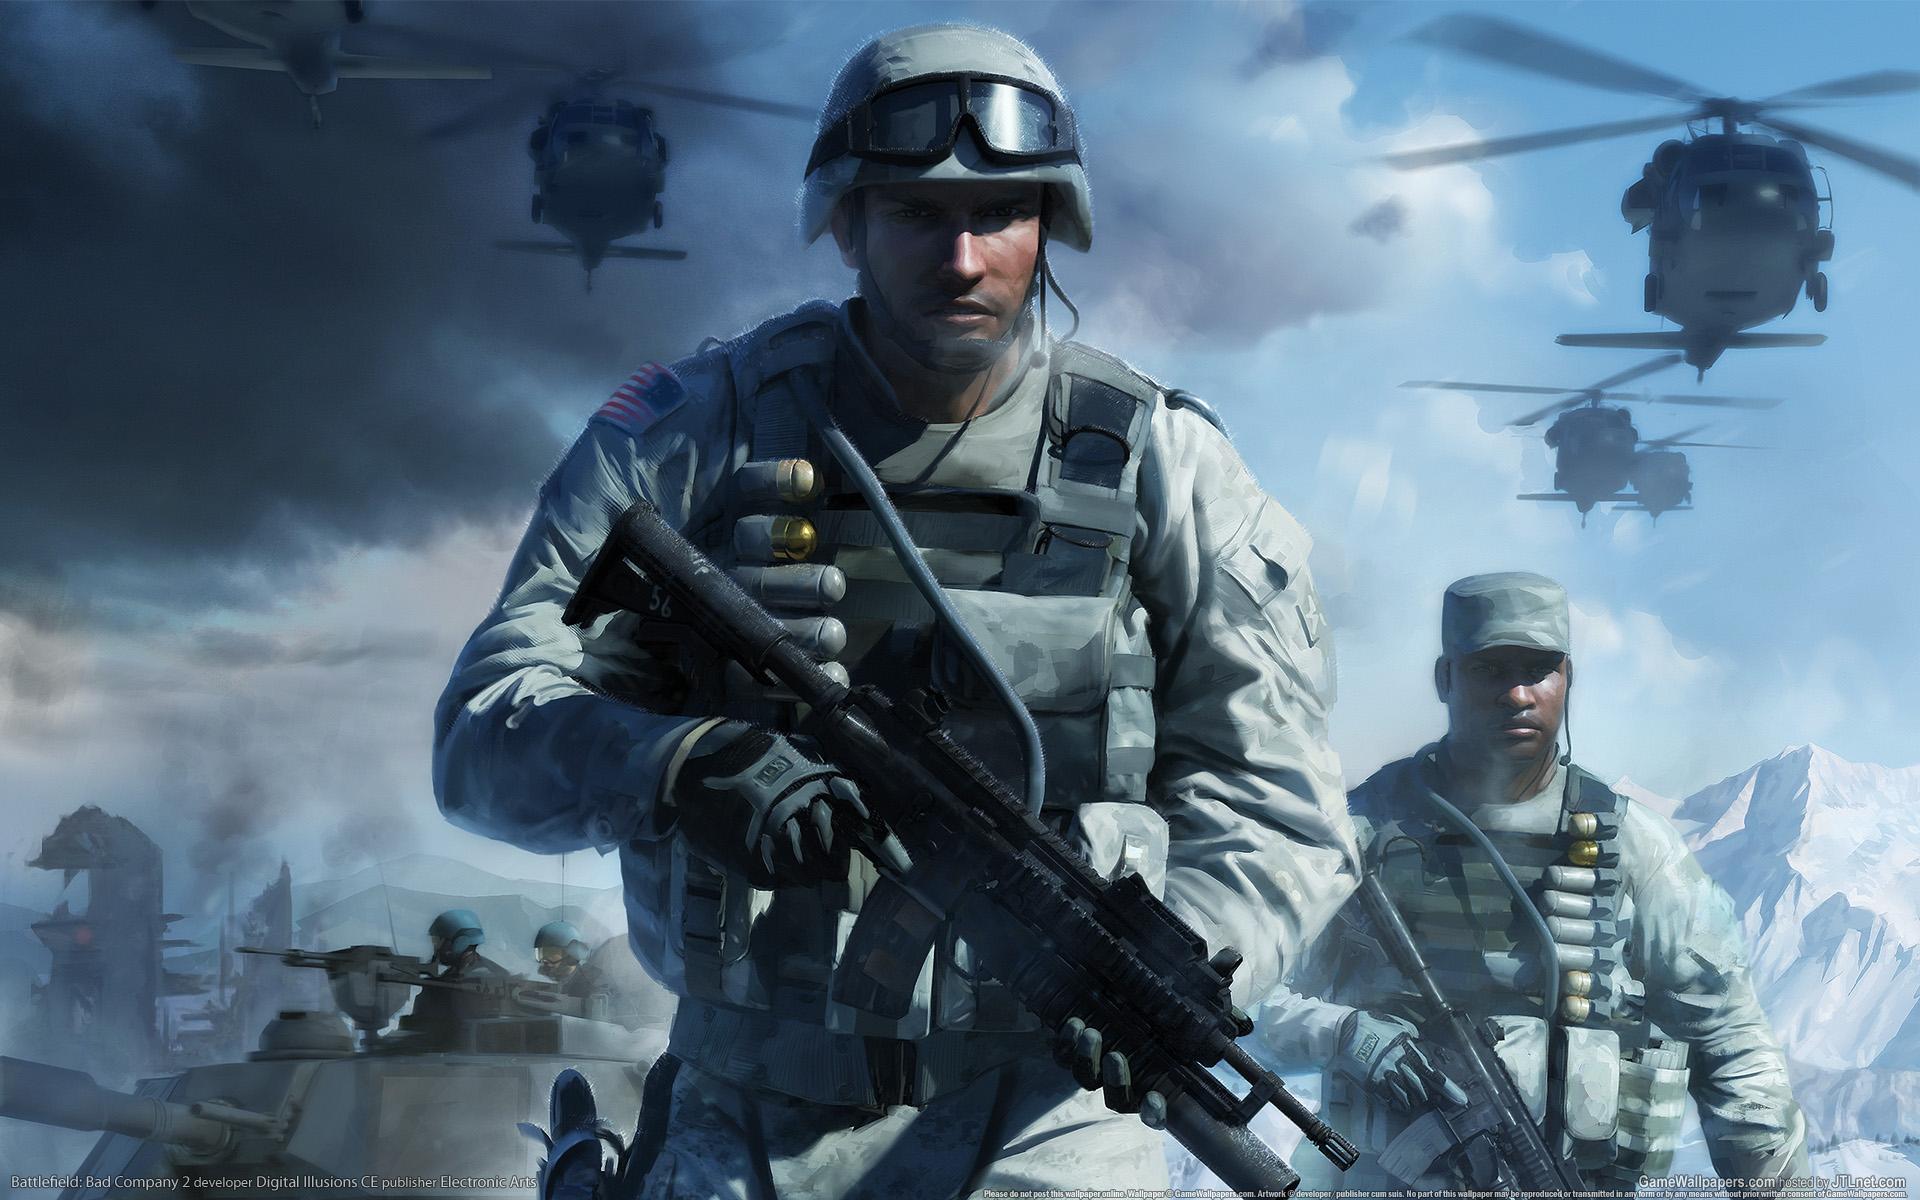 Battlefield Bad Company 1 Wallpaper 11 of 208 1920x1200